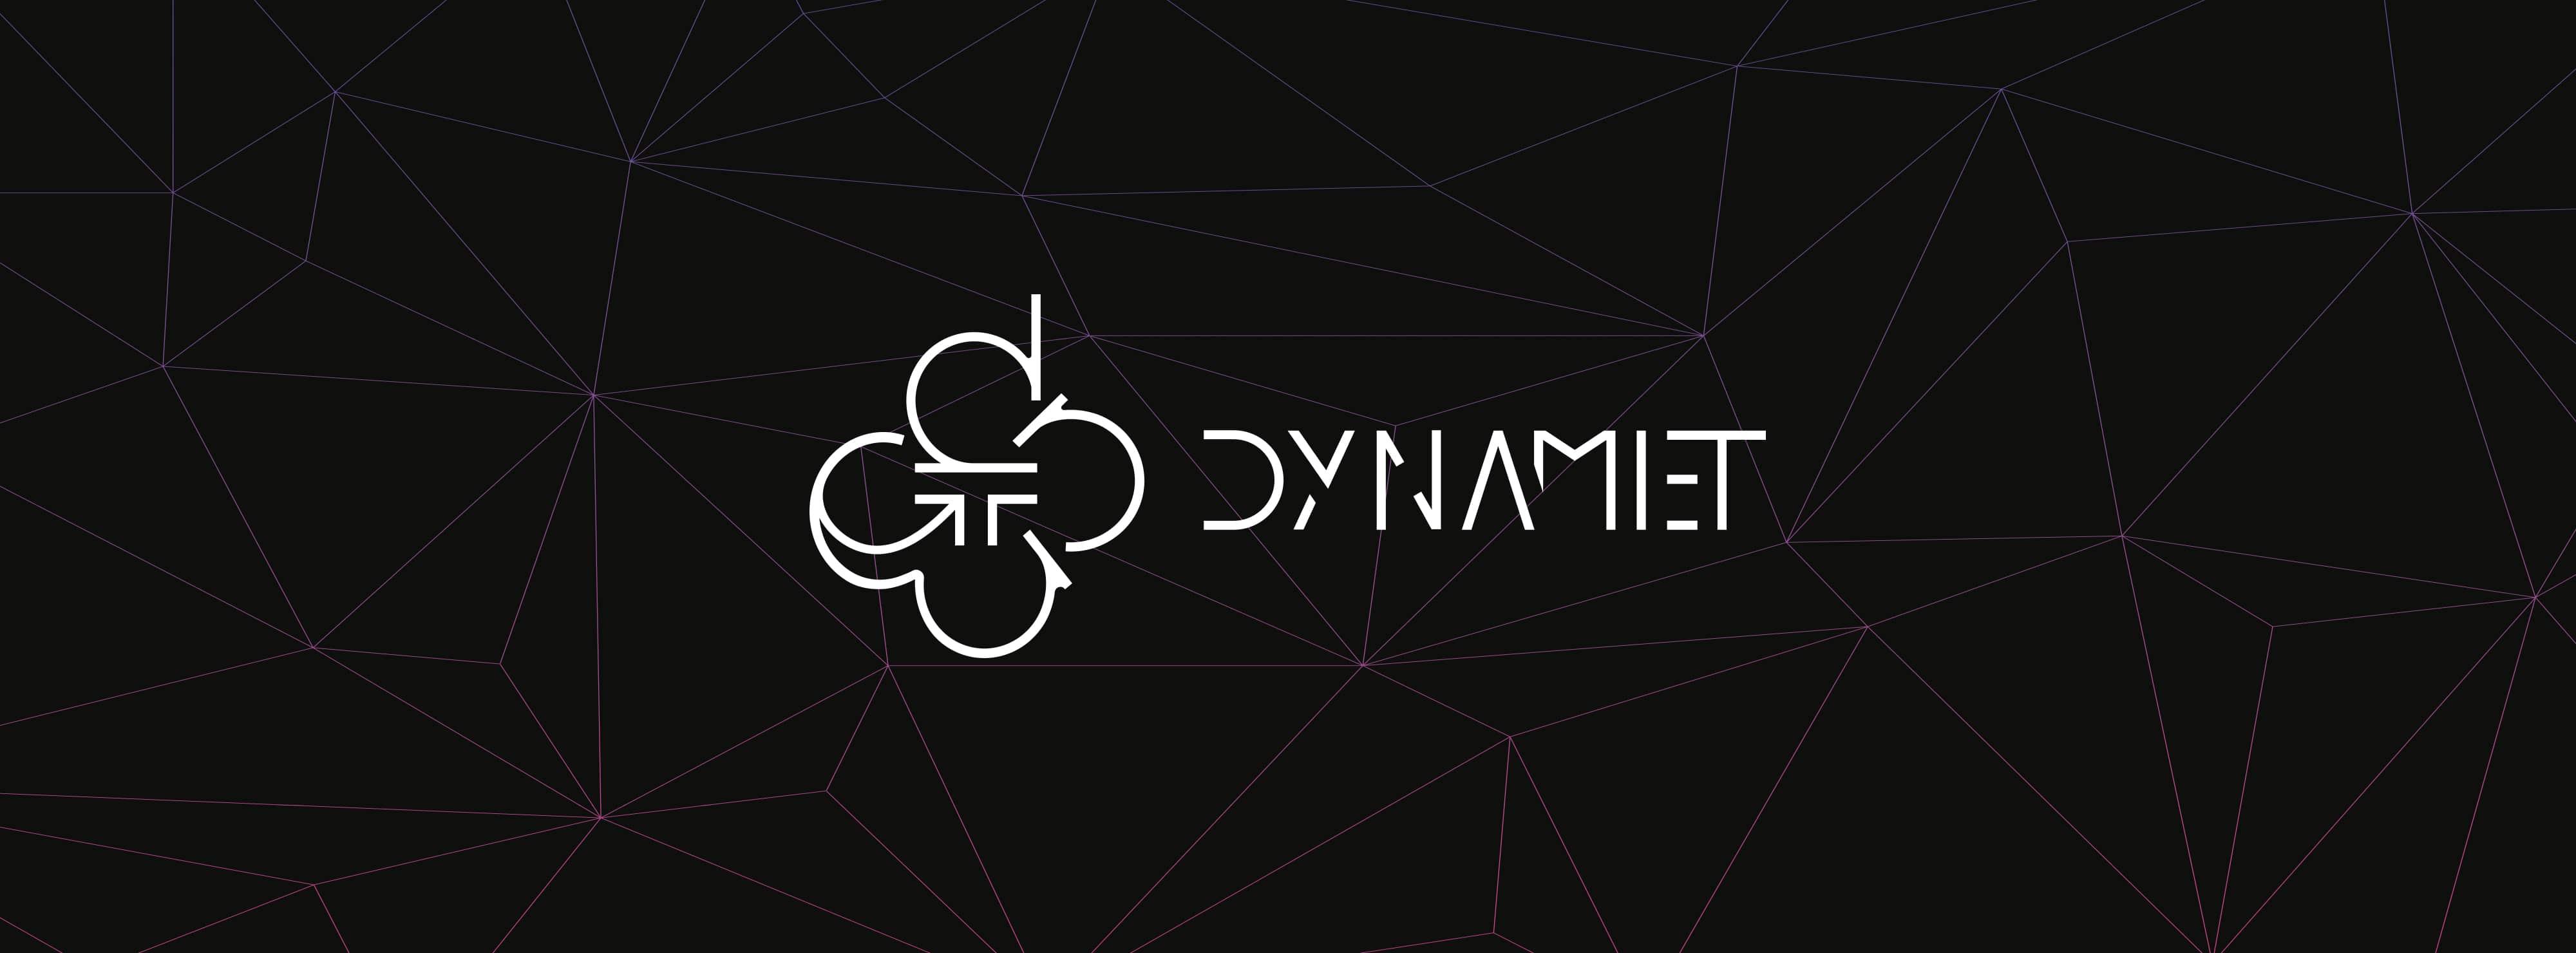 2dce29755fa Home - Dynamiet